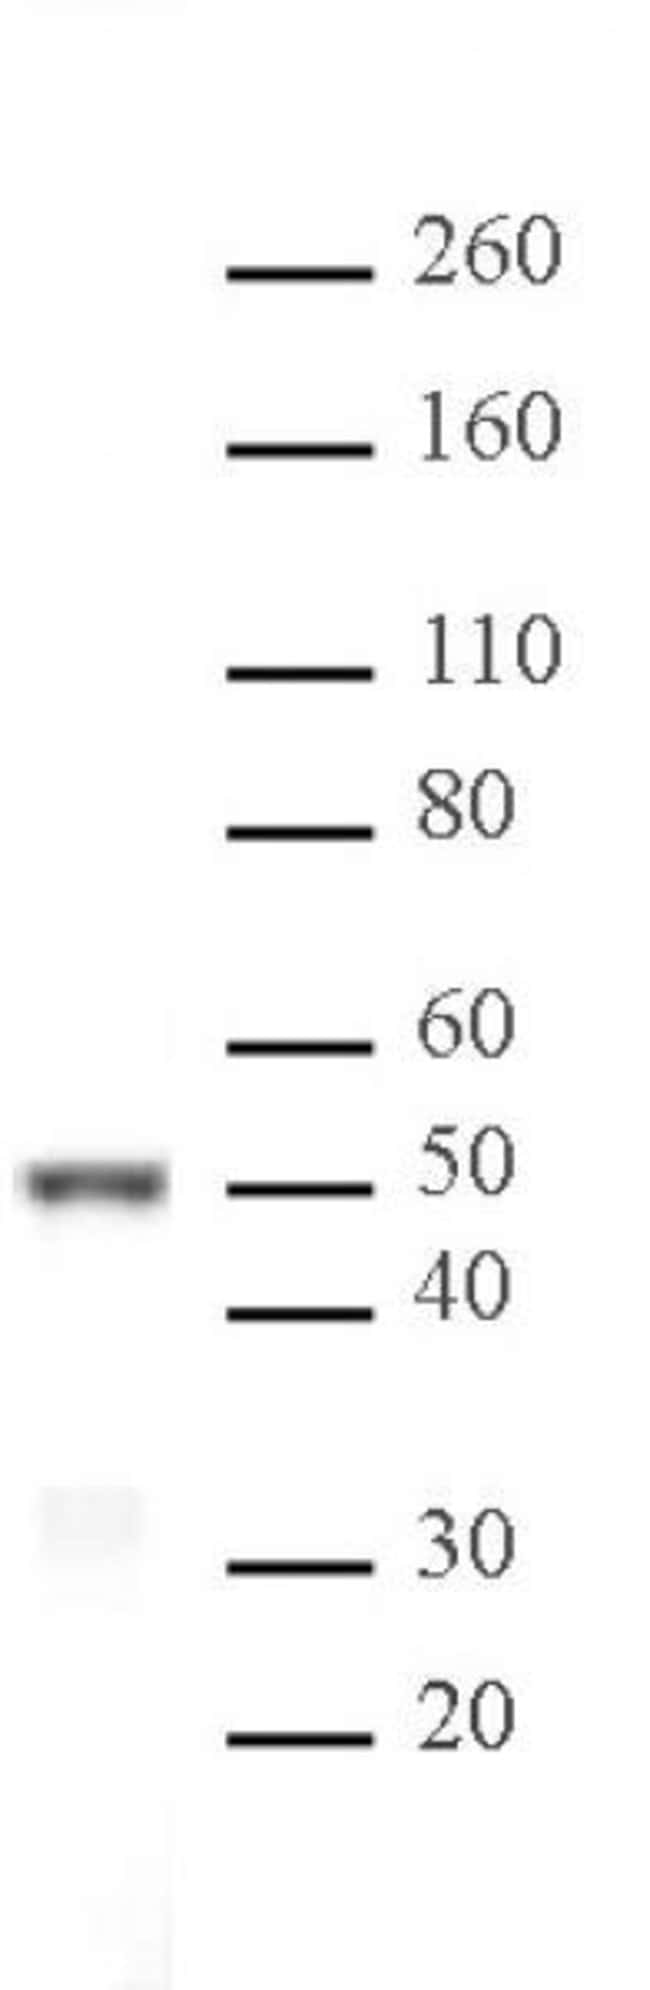 IRF-3 Rabbit anti-Human, Unconjugated, Polyclonal, Active Motif:Antibodies:Primary